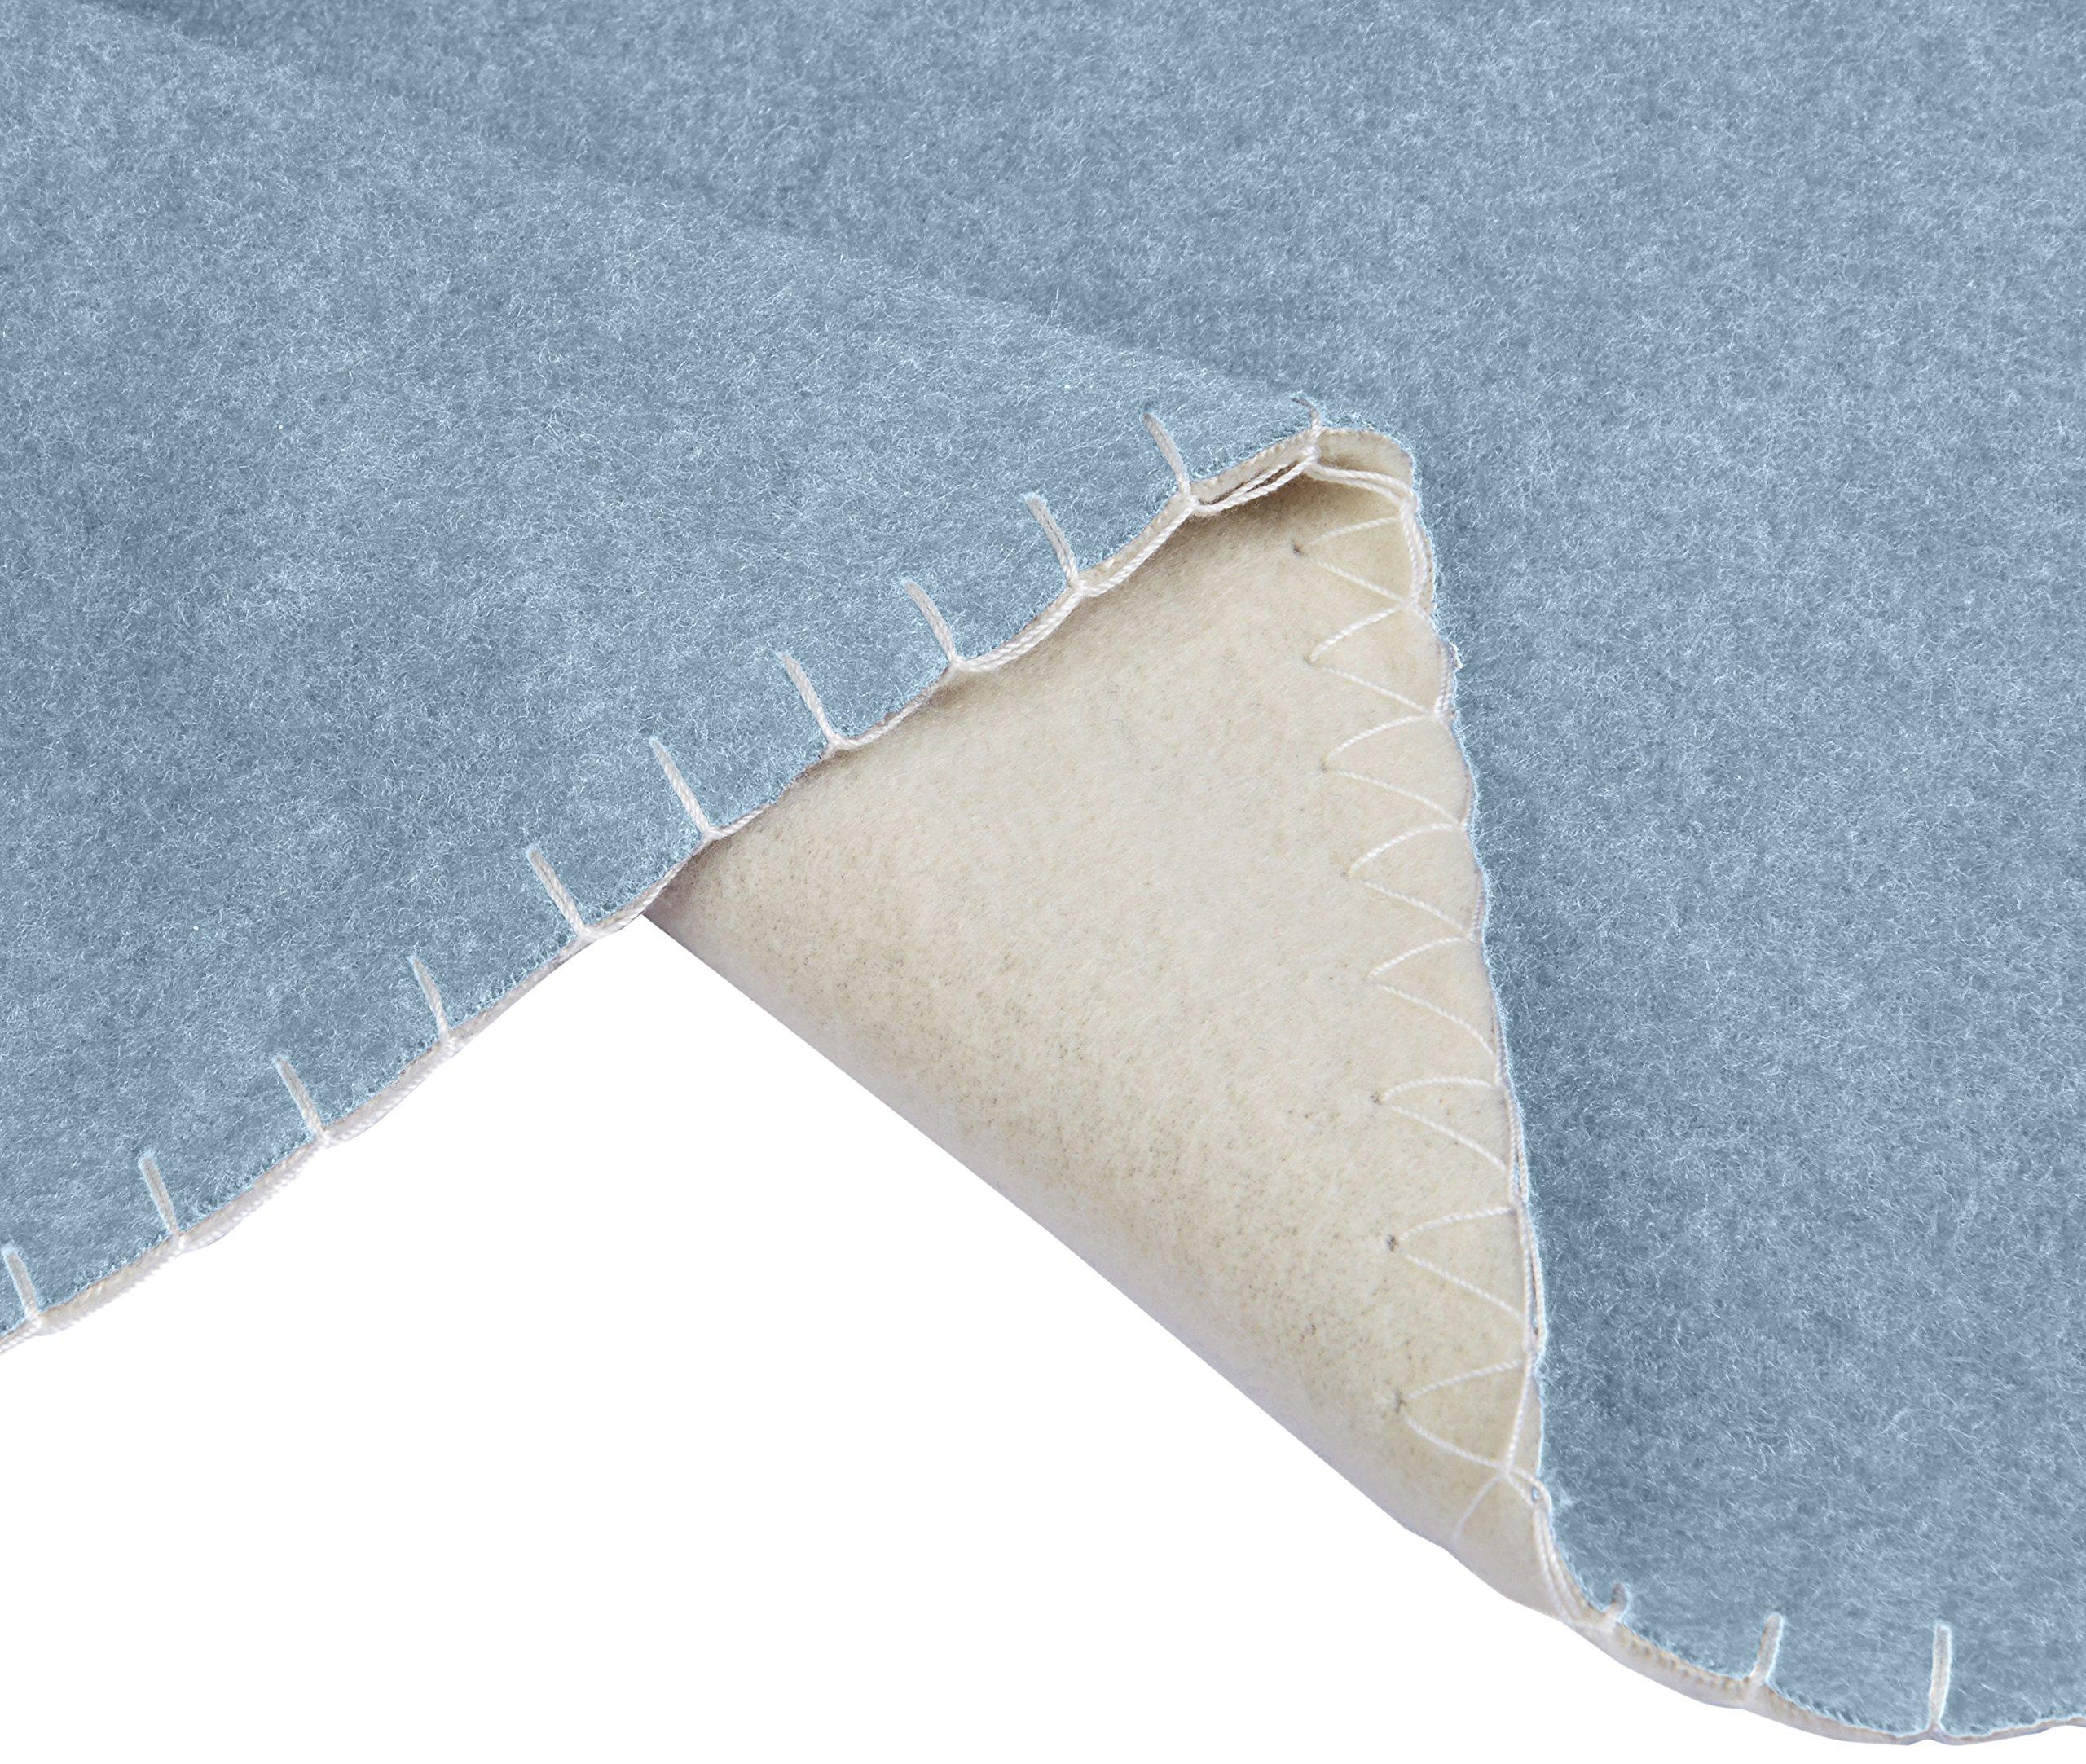 AmazonBasics Reversible Fleece Blanket - Throw, Spa Blue/Taupe by AmazonBasics (Image #3)